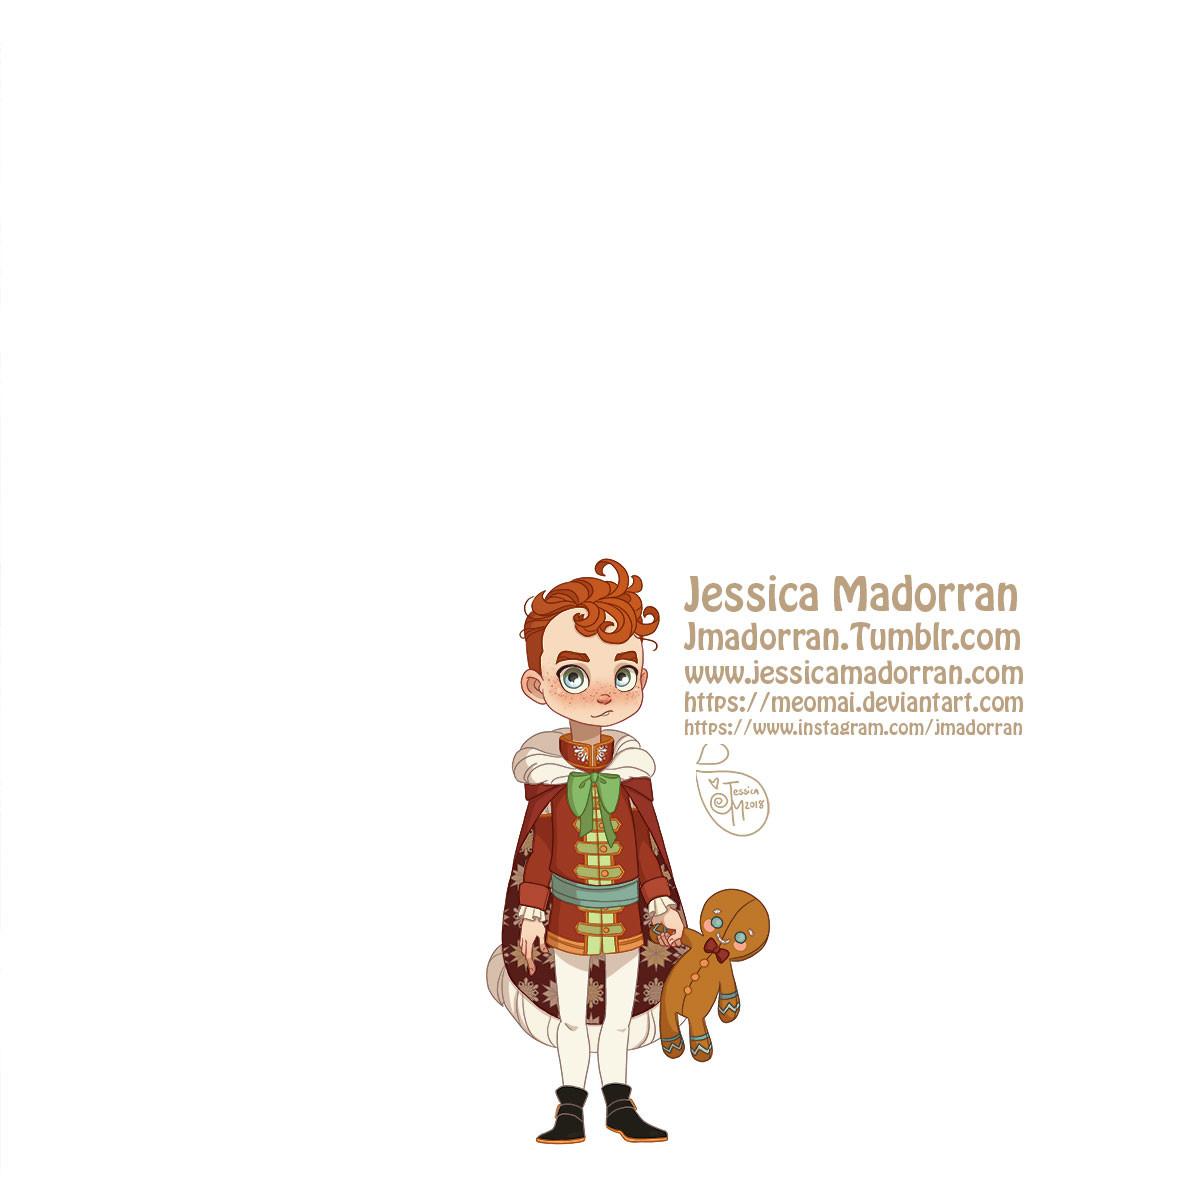 Jessica madorran character design paris 2018 versailles santa family individuals son